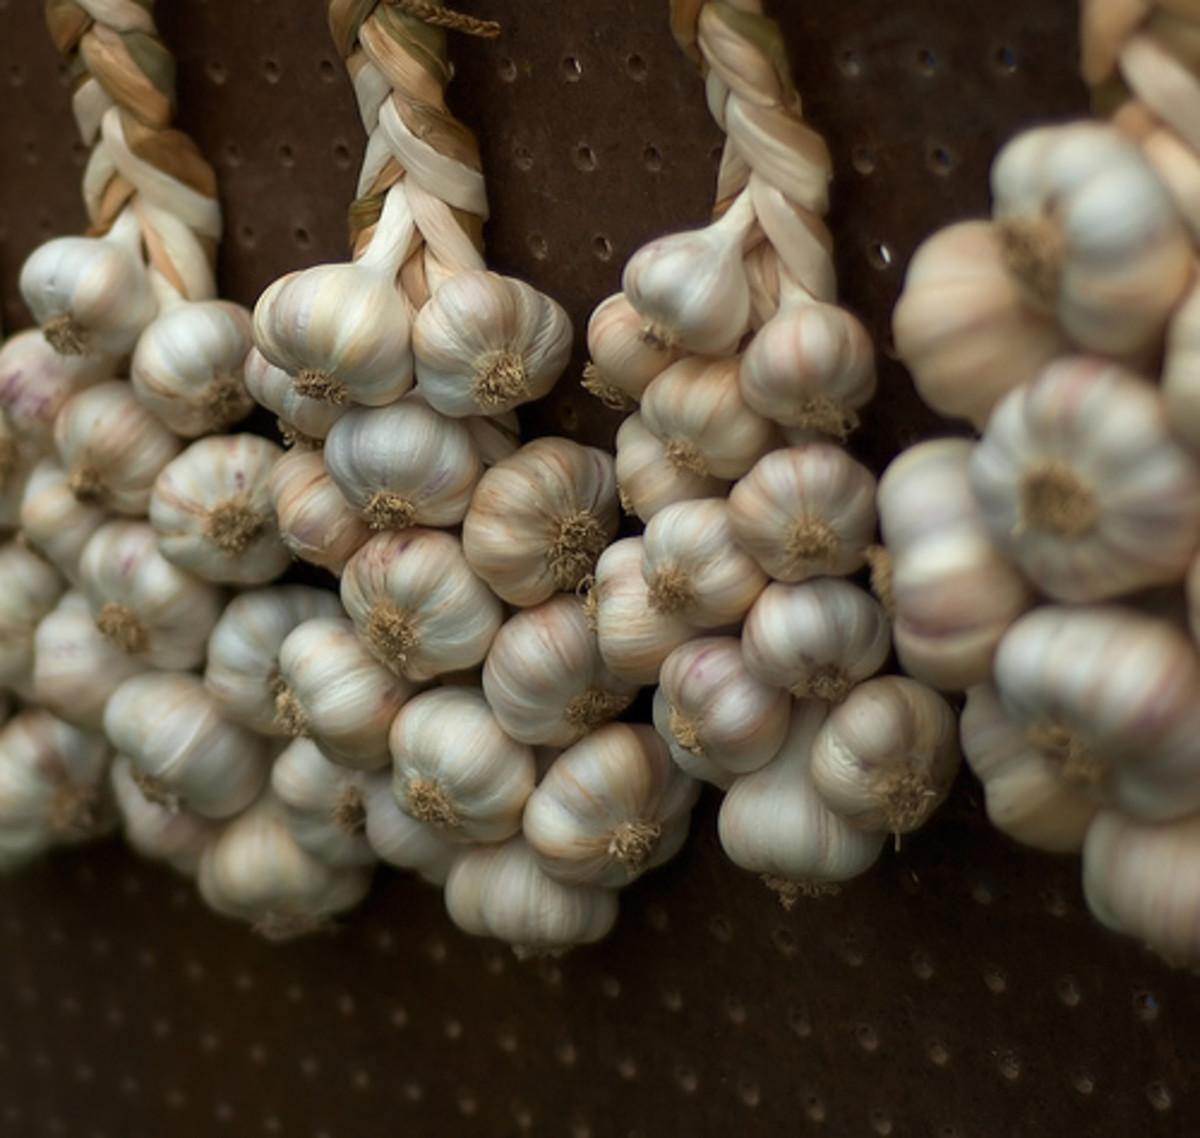 Braided garlic (Creative Commons - CC BY 3.0 - via Flickr).